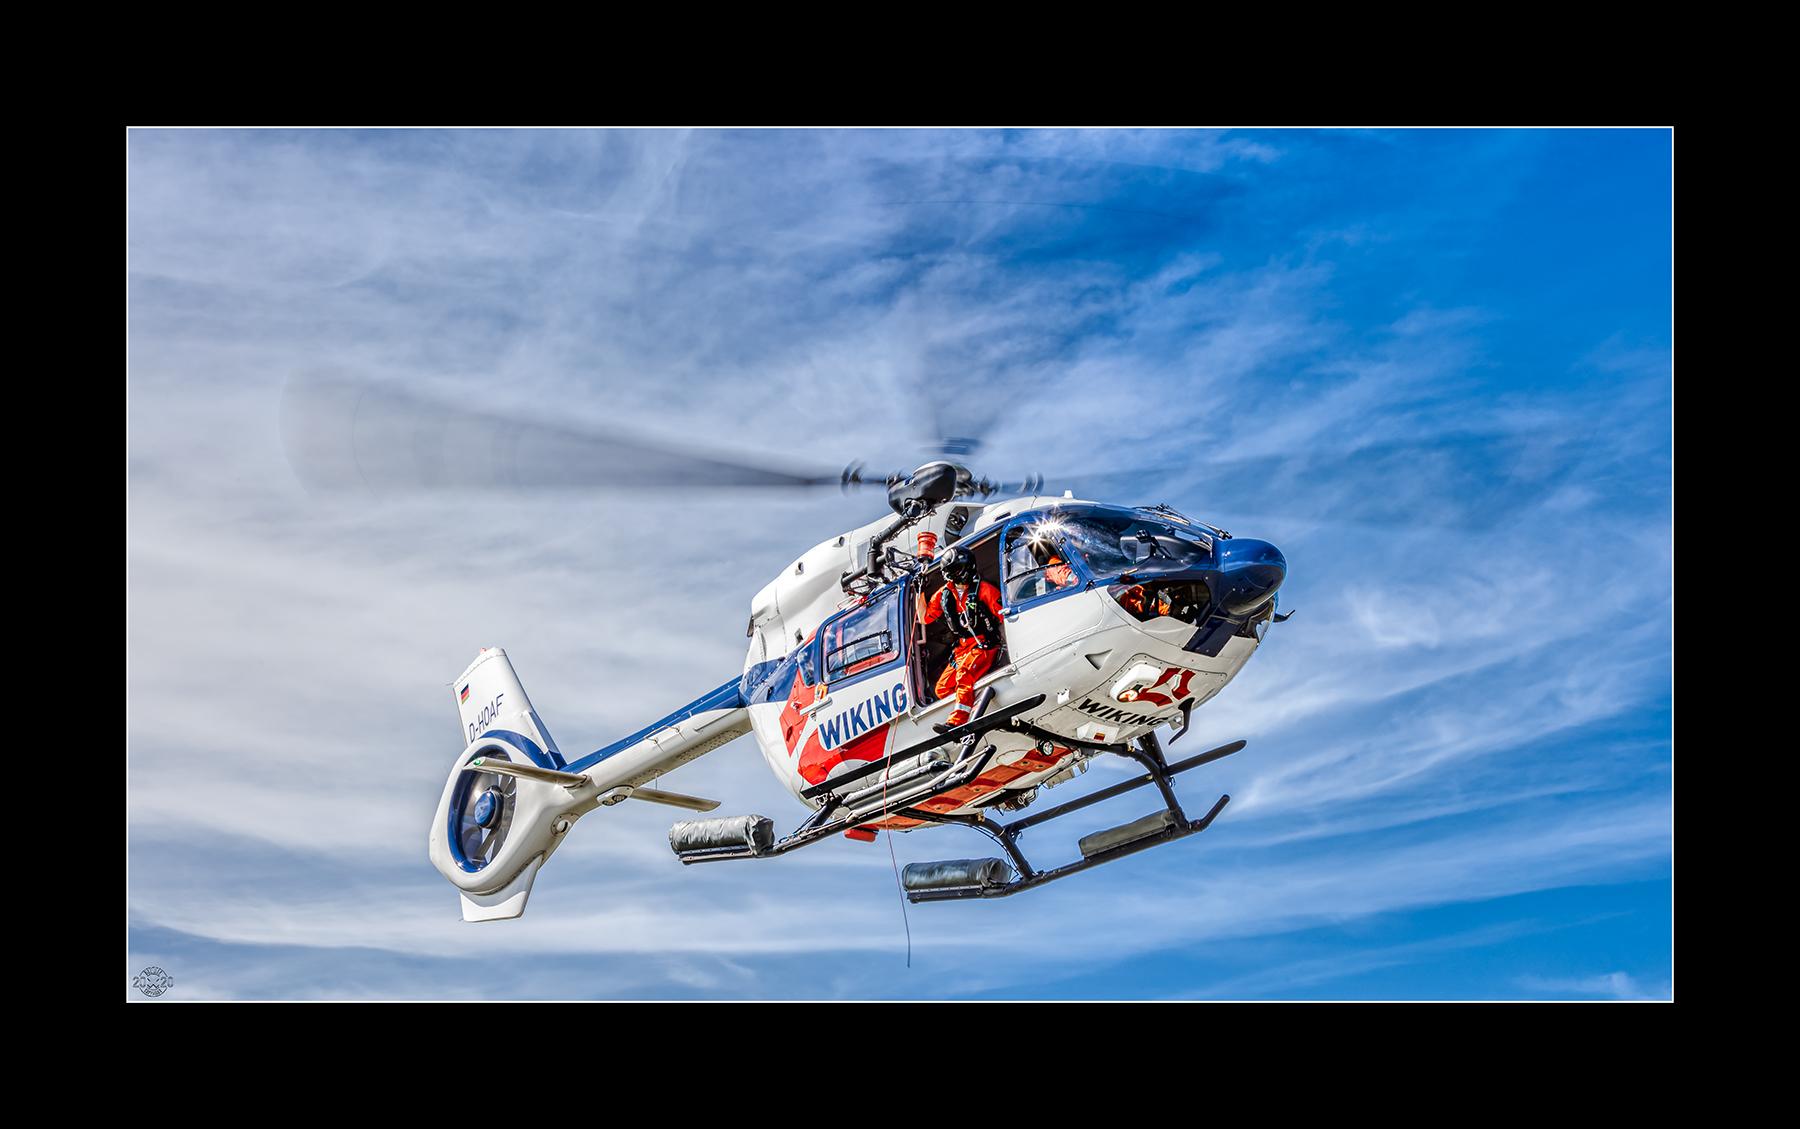 H-145 von Wiking Helicopters